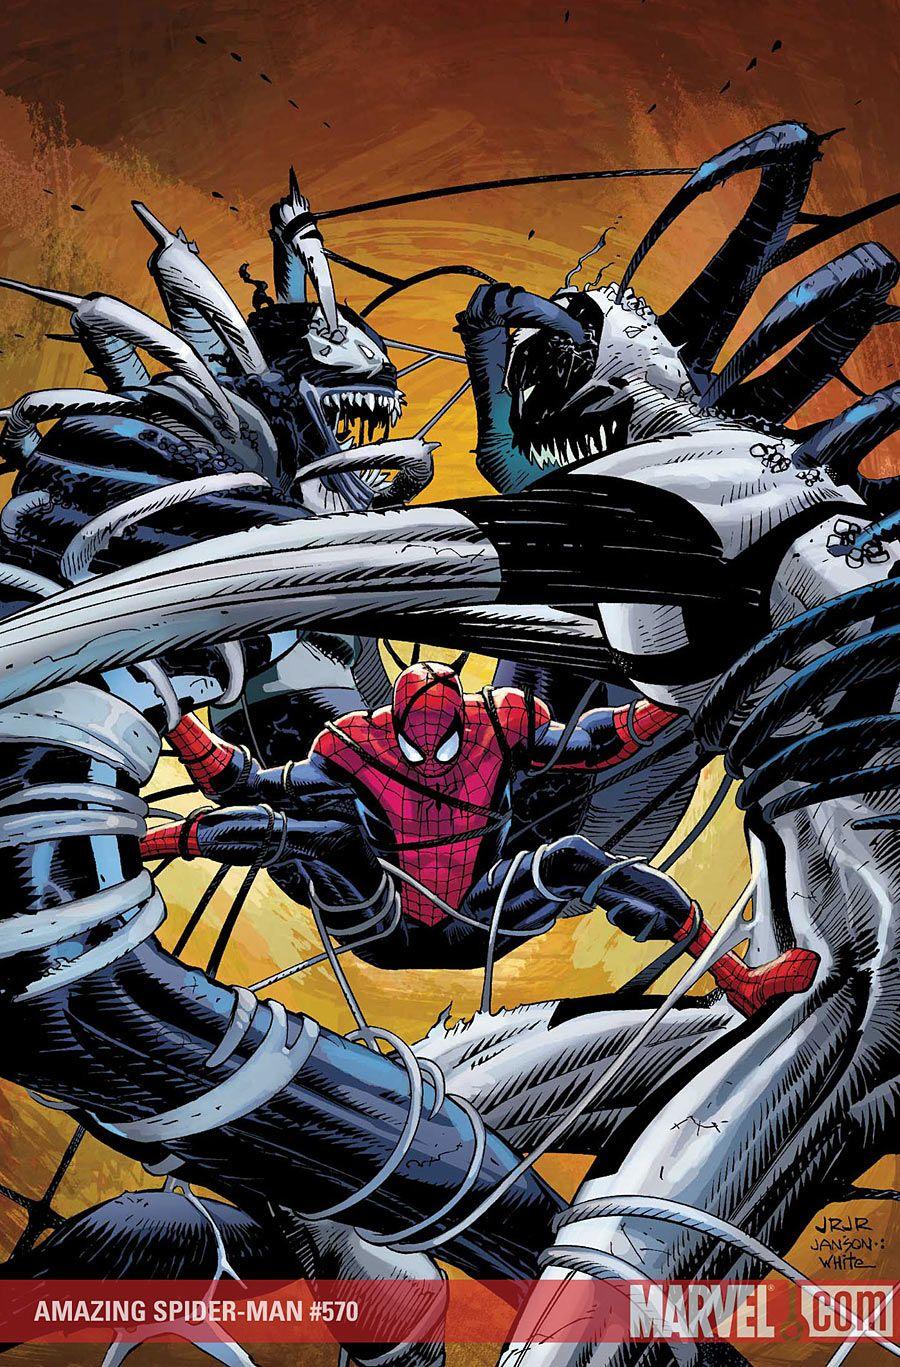 #Spiderman #Fan #Art. (AMAZING SPIDER-MAN #570 Cover) By: JOHN ROMITA JR. ÅWESOMENESS!!! [THANK U 4 PINNING!!]